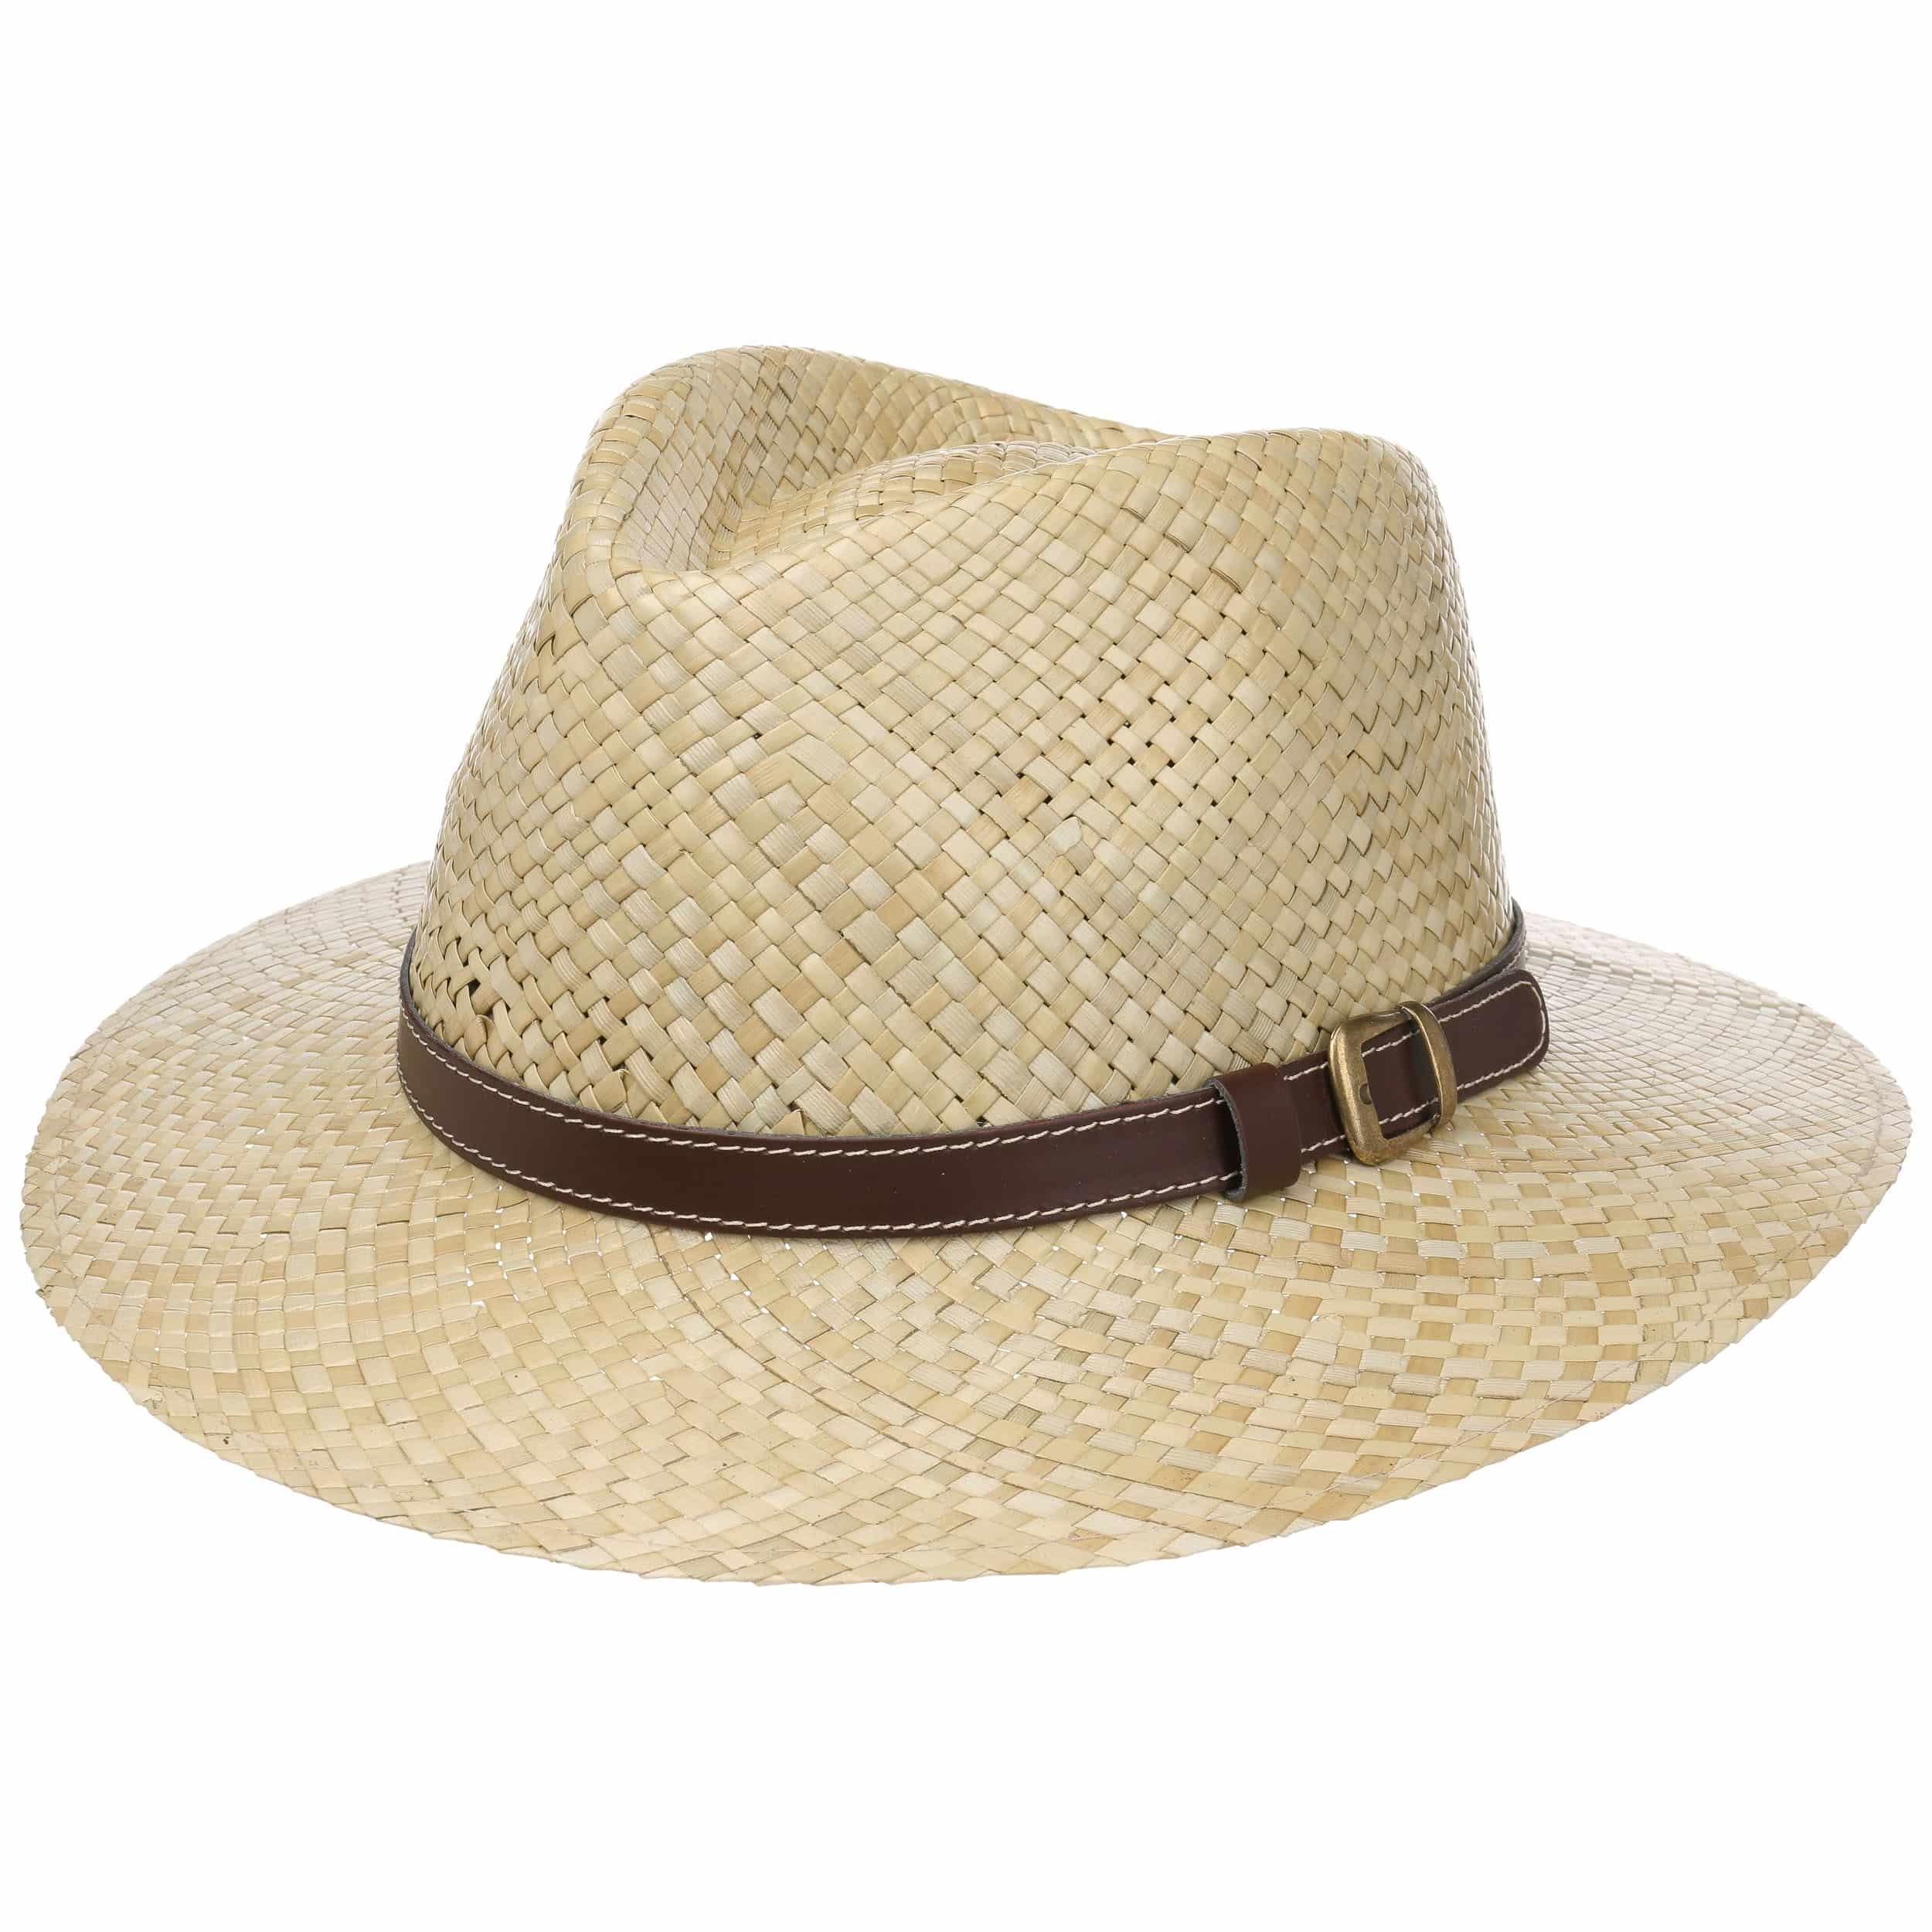 Made in Italy Sun Summer Beach with Grosgrain Band Spring-Summer Lipodo Black Traveller Straw Hat Men